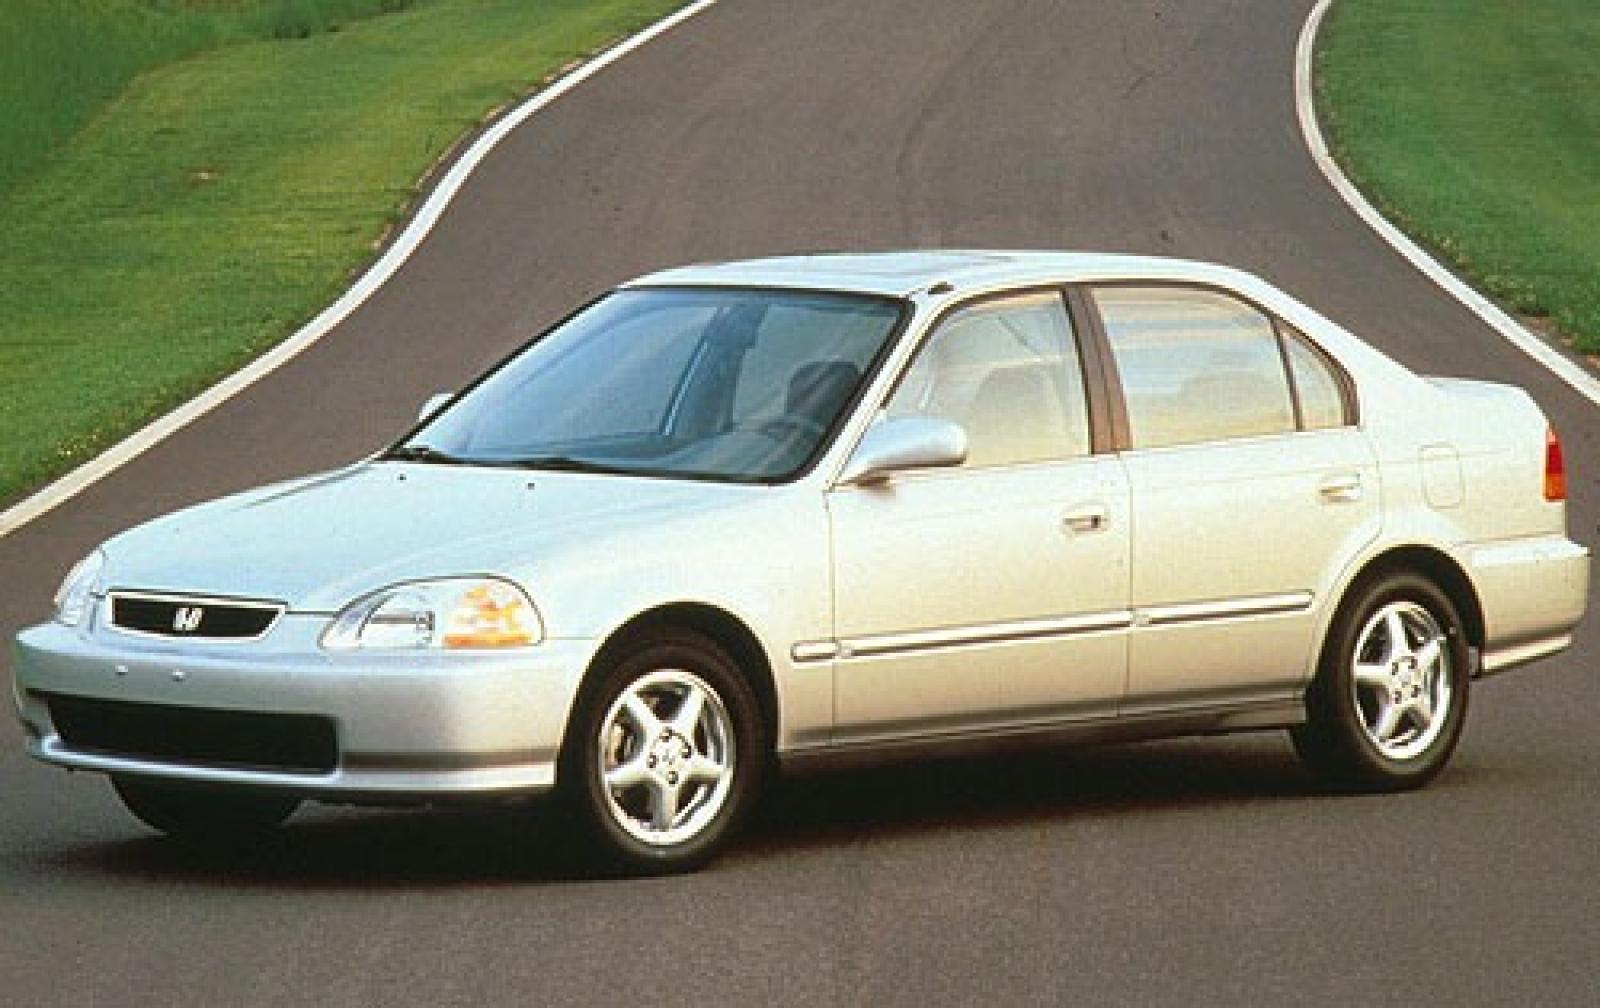 1996 Honda Civic Information And Photos Zombiedrive